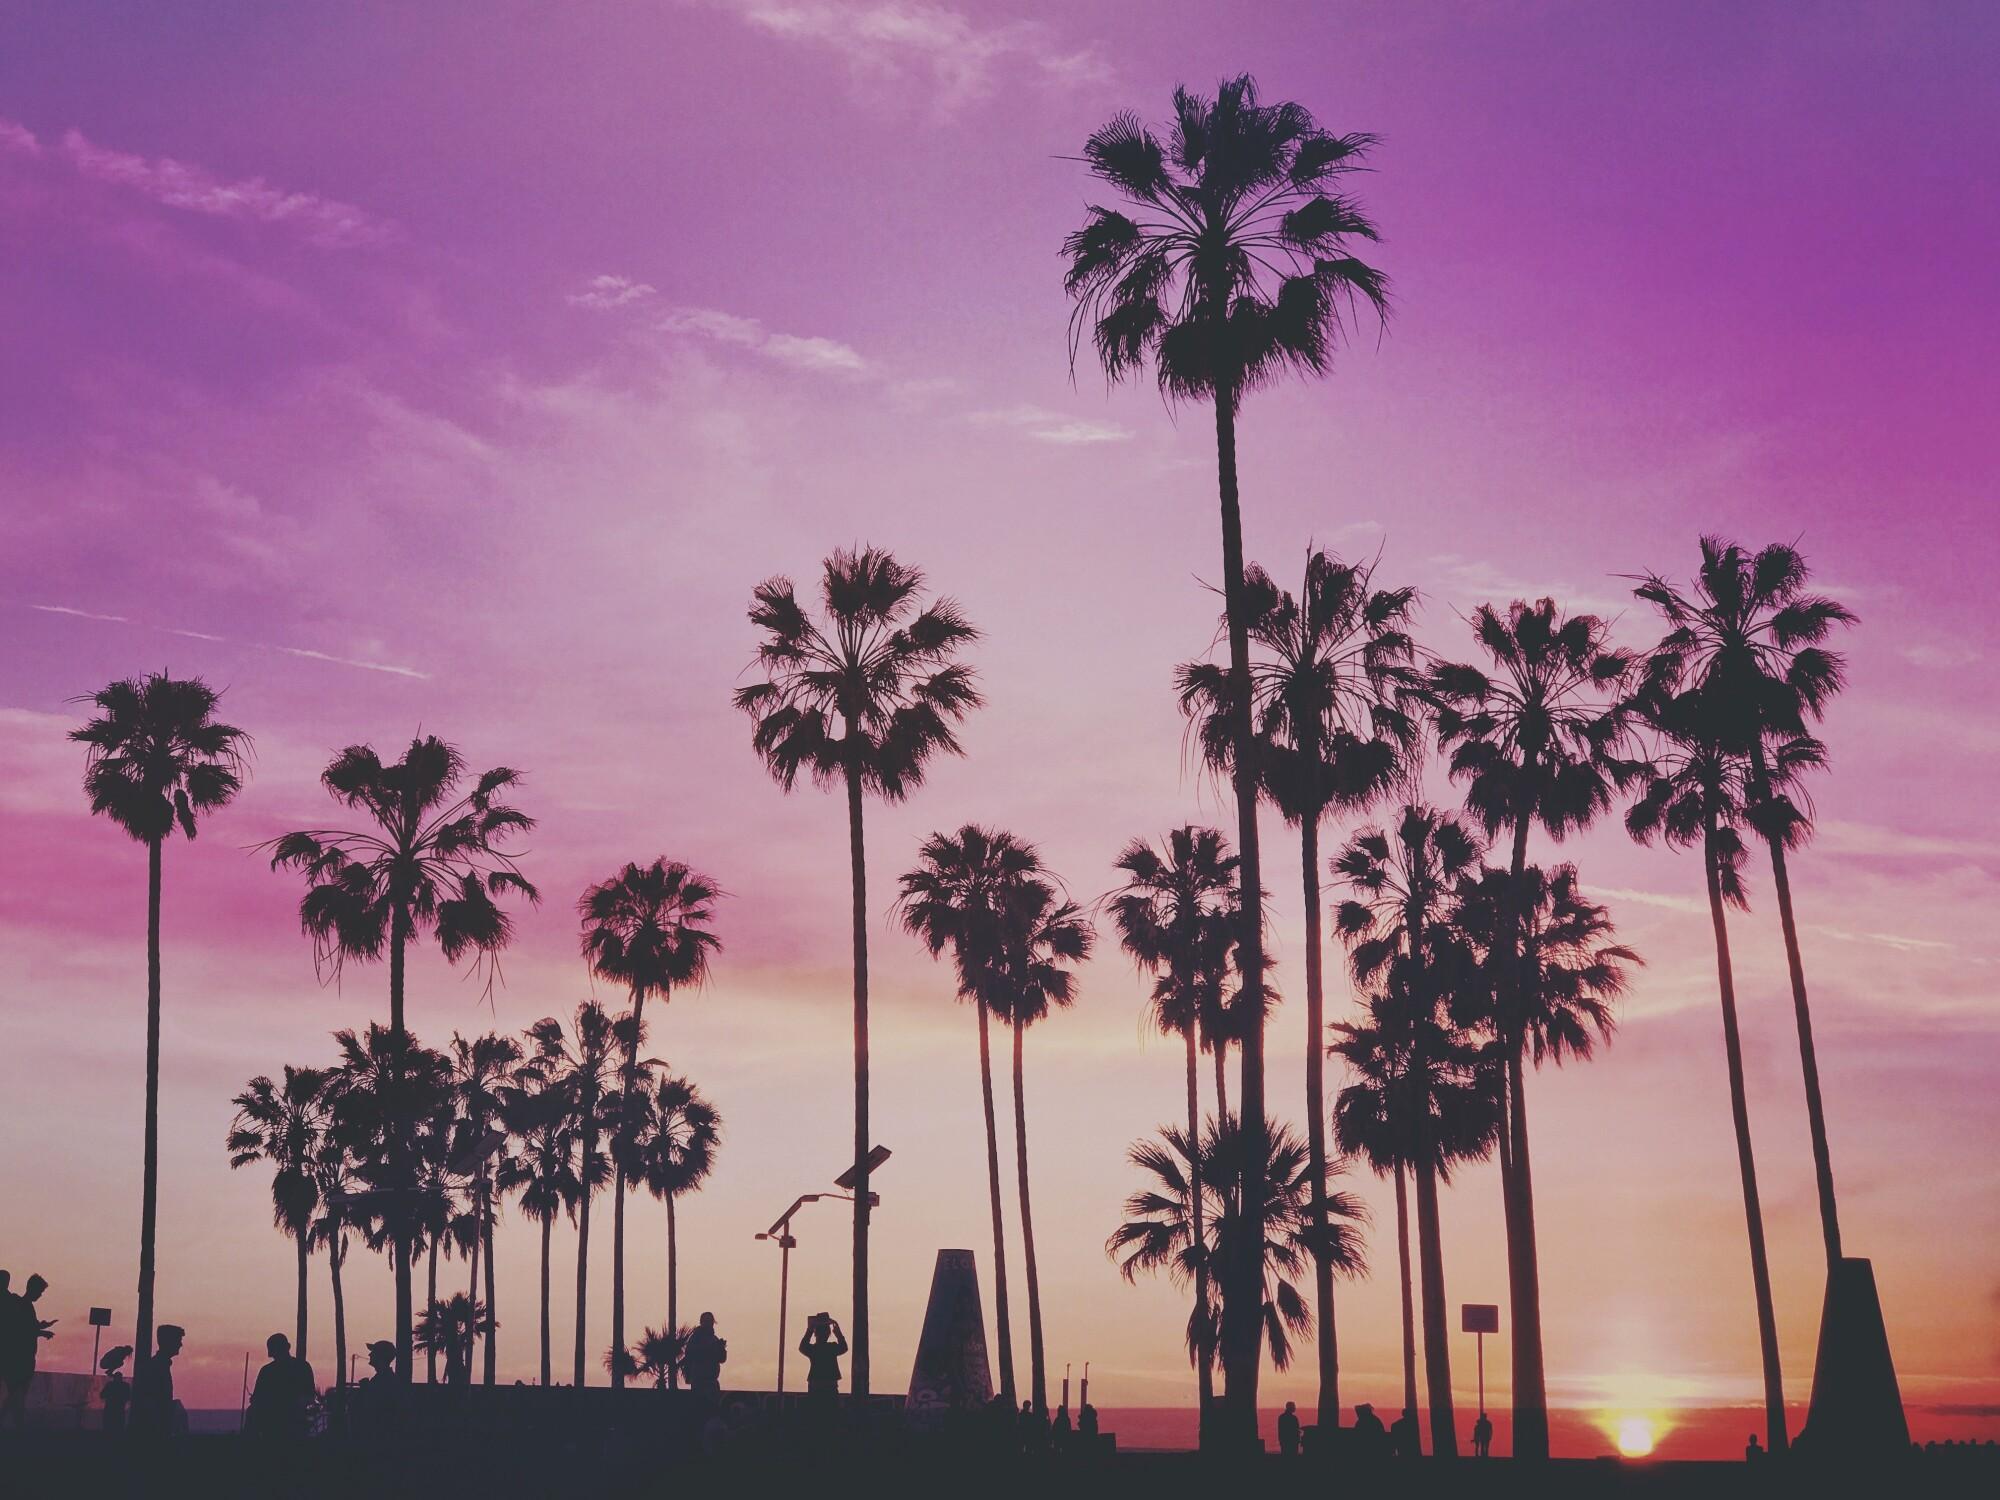 sober living in Los Angeles